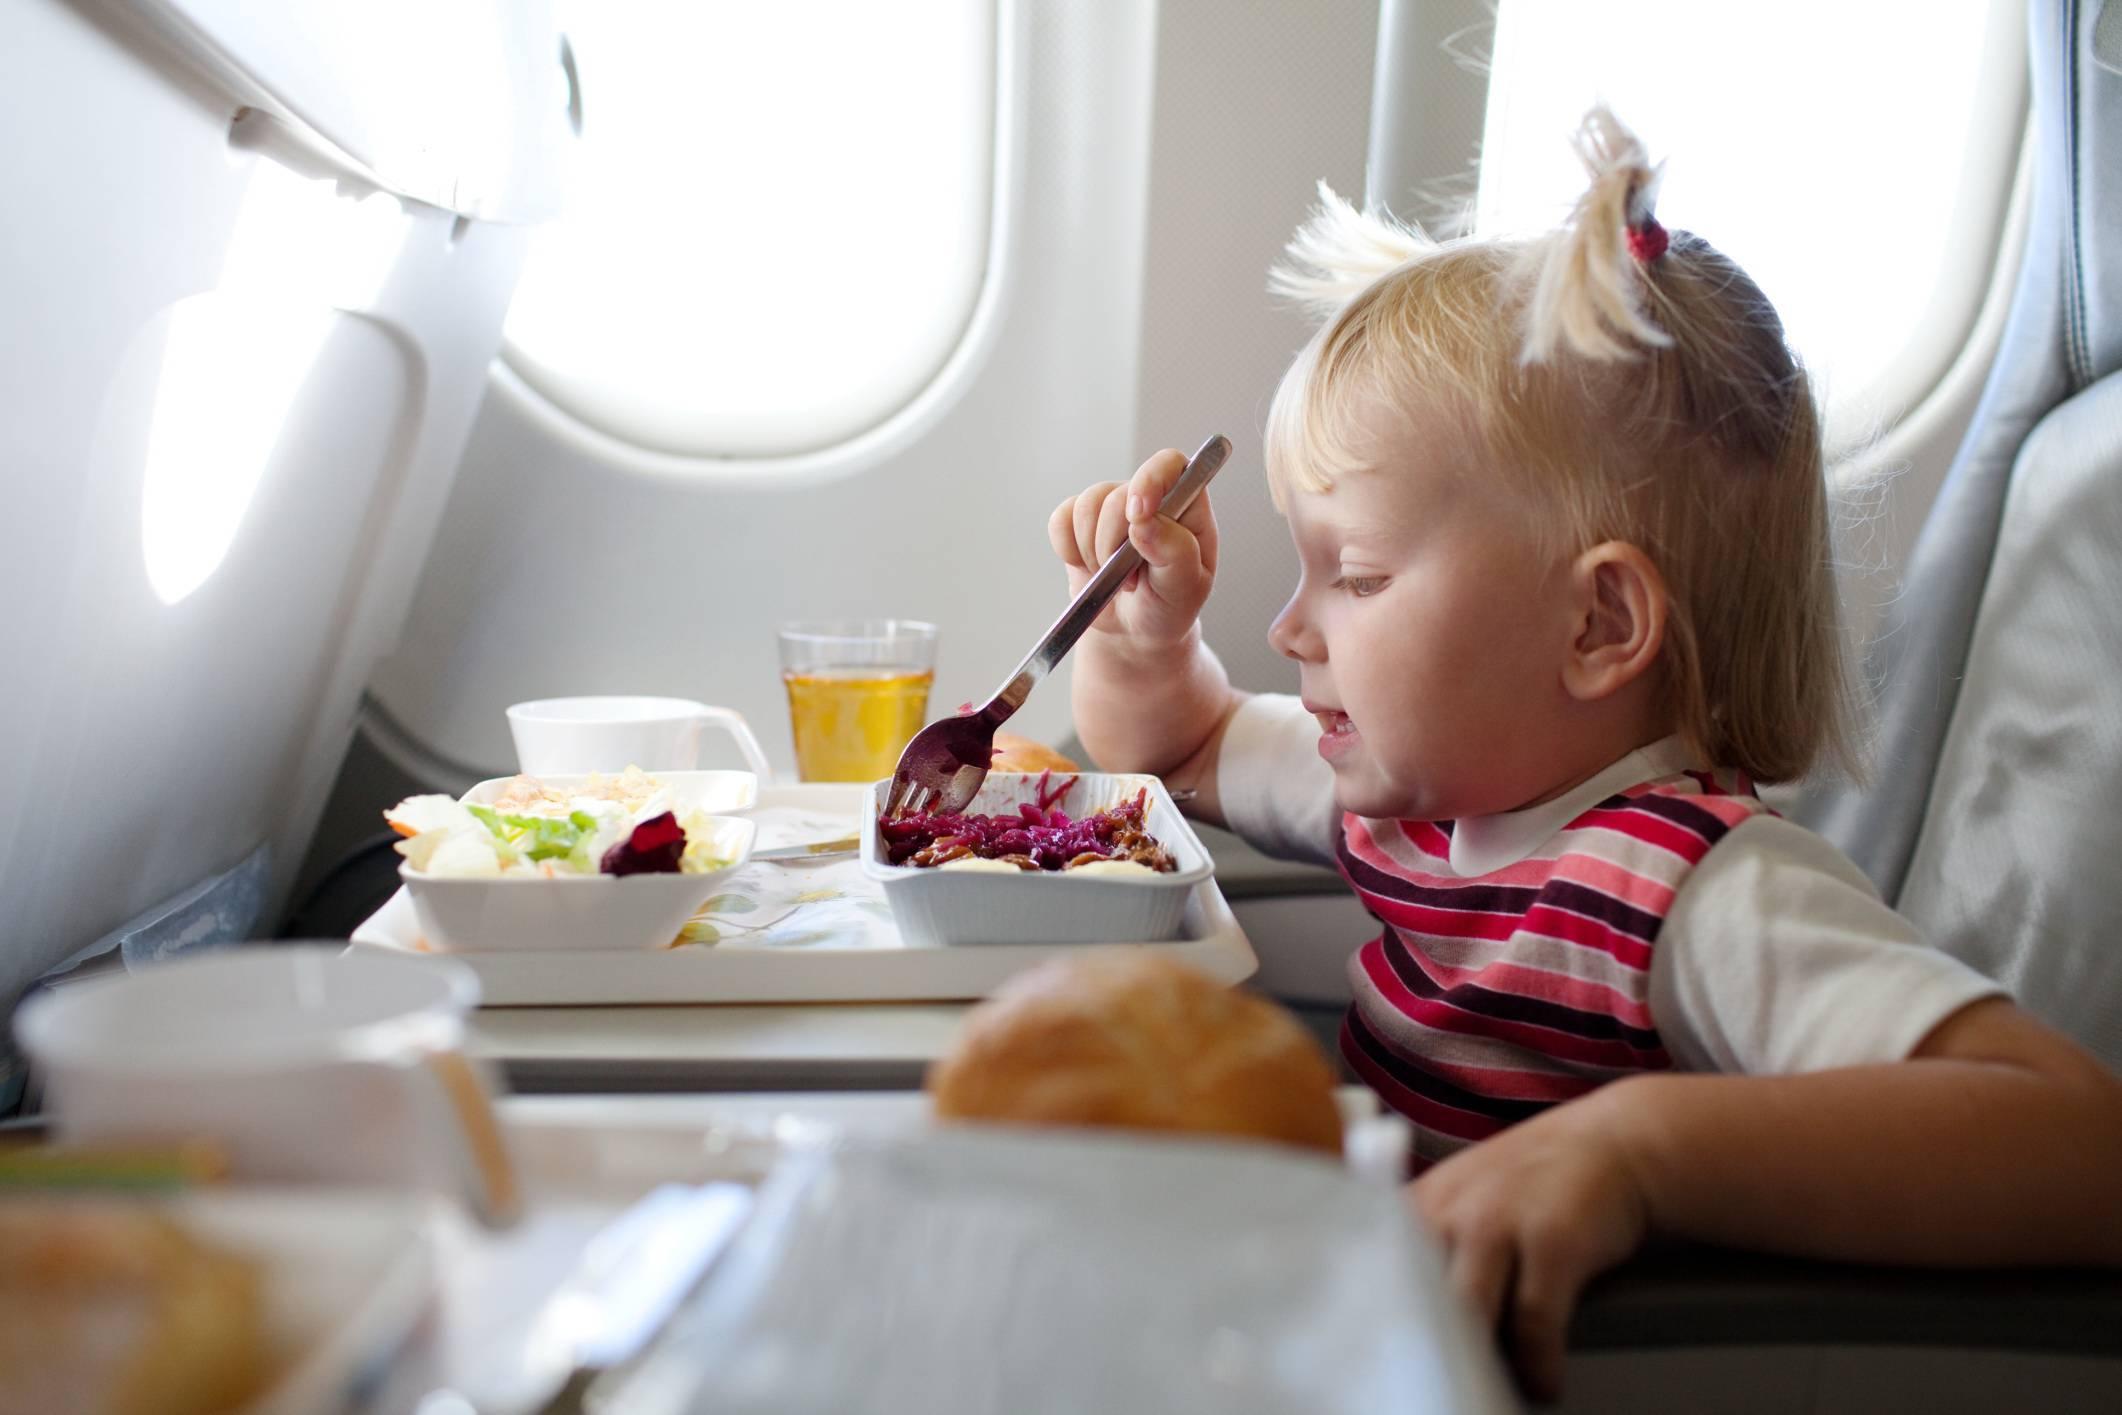 Bambina mangia su aereoplano